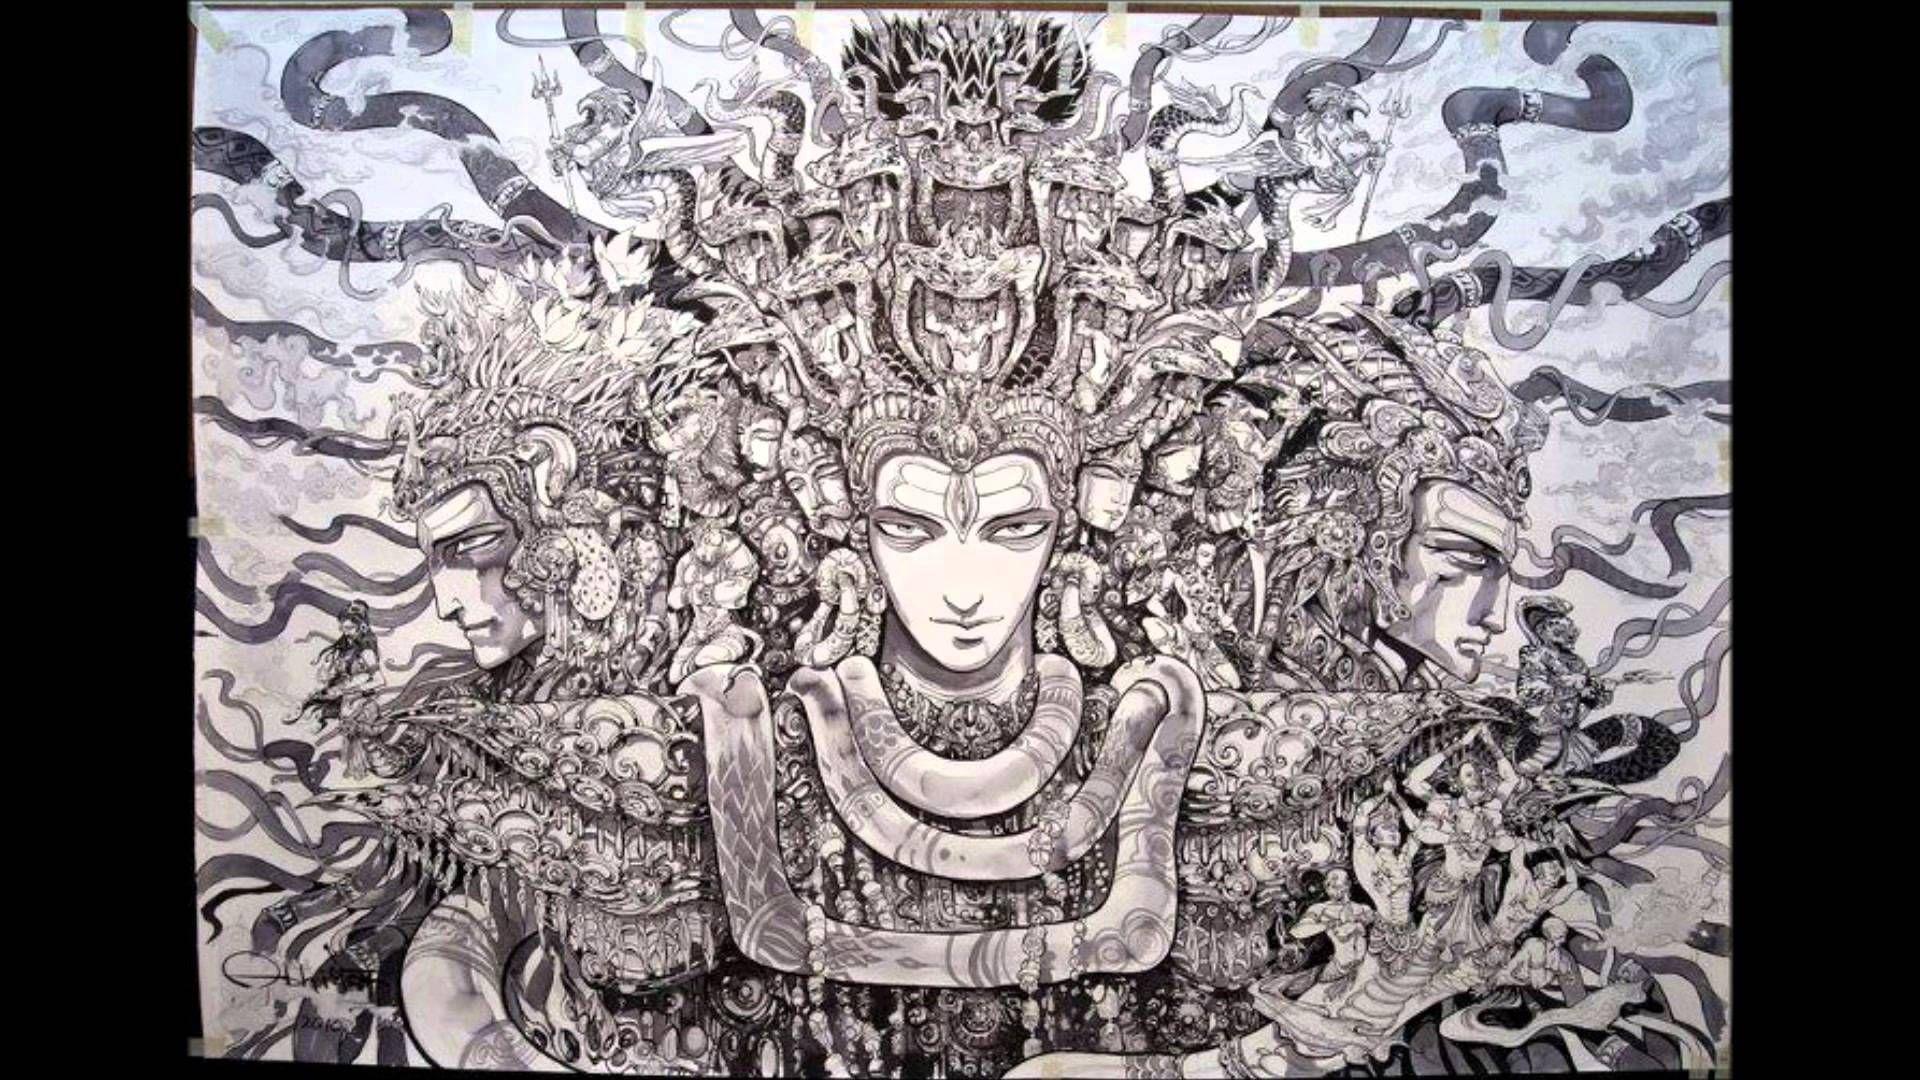 Shiva Wallpaper Hd Trance | www.pixshark.com - Images ...